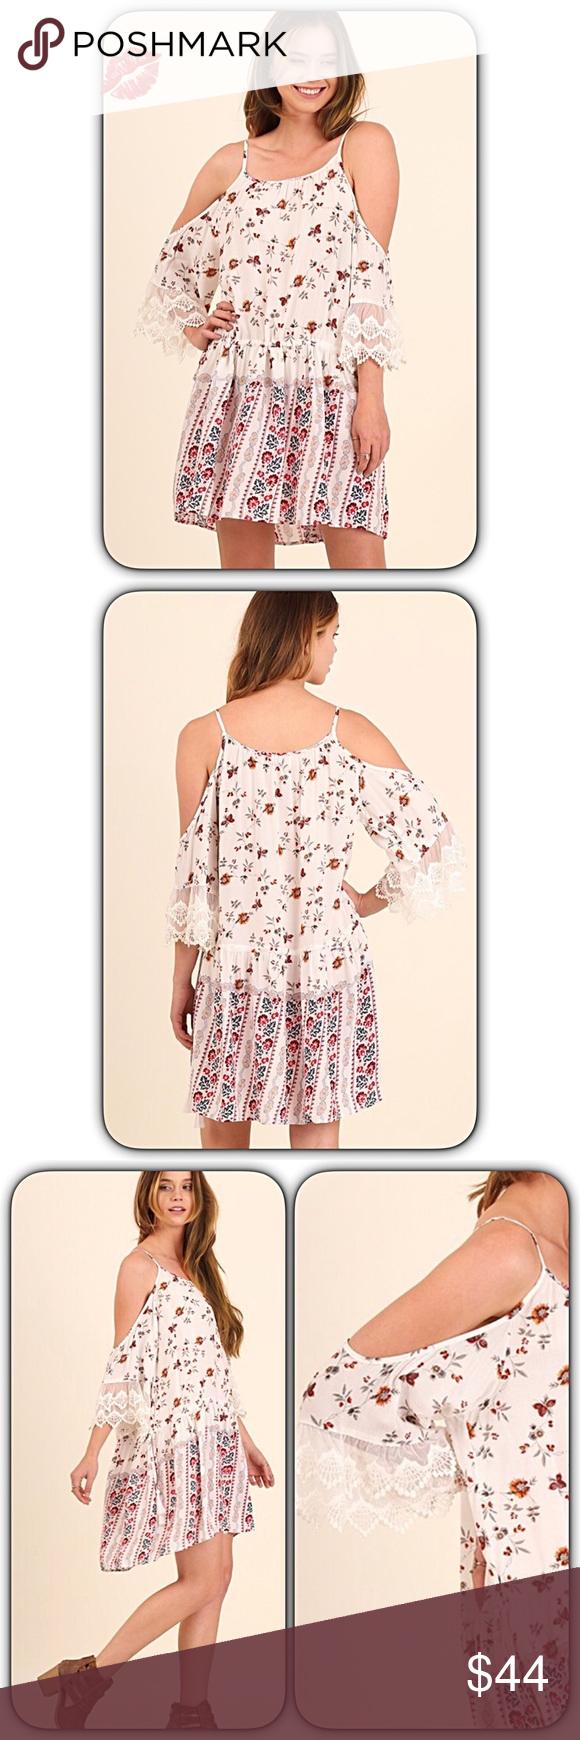 d86f212521 Fall Leaves Floral Bohemian Open Shoulder DressSML Gorgeous Boho Chic Floral  Print Open Shoulder Dress! Adjustable cinch drop waist with tasseled  drawstring ...